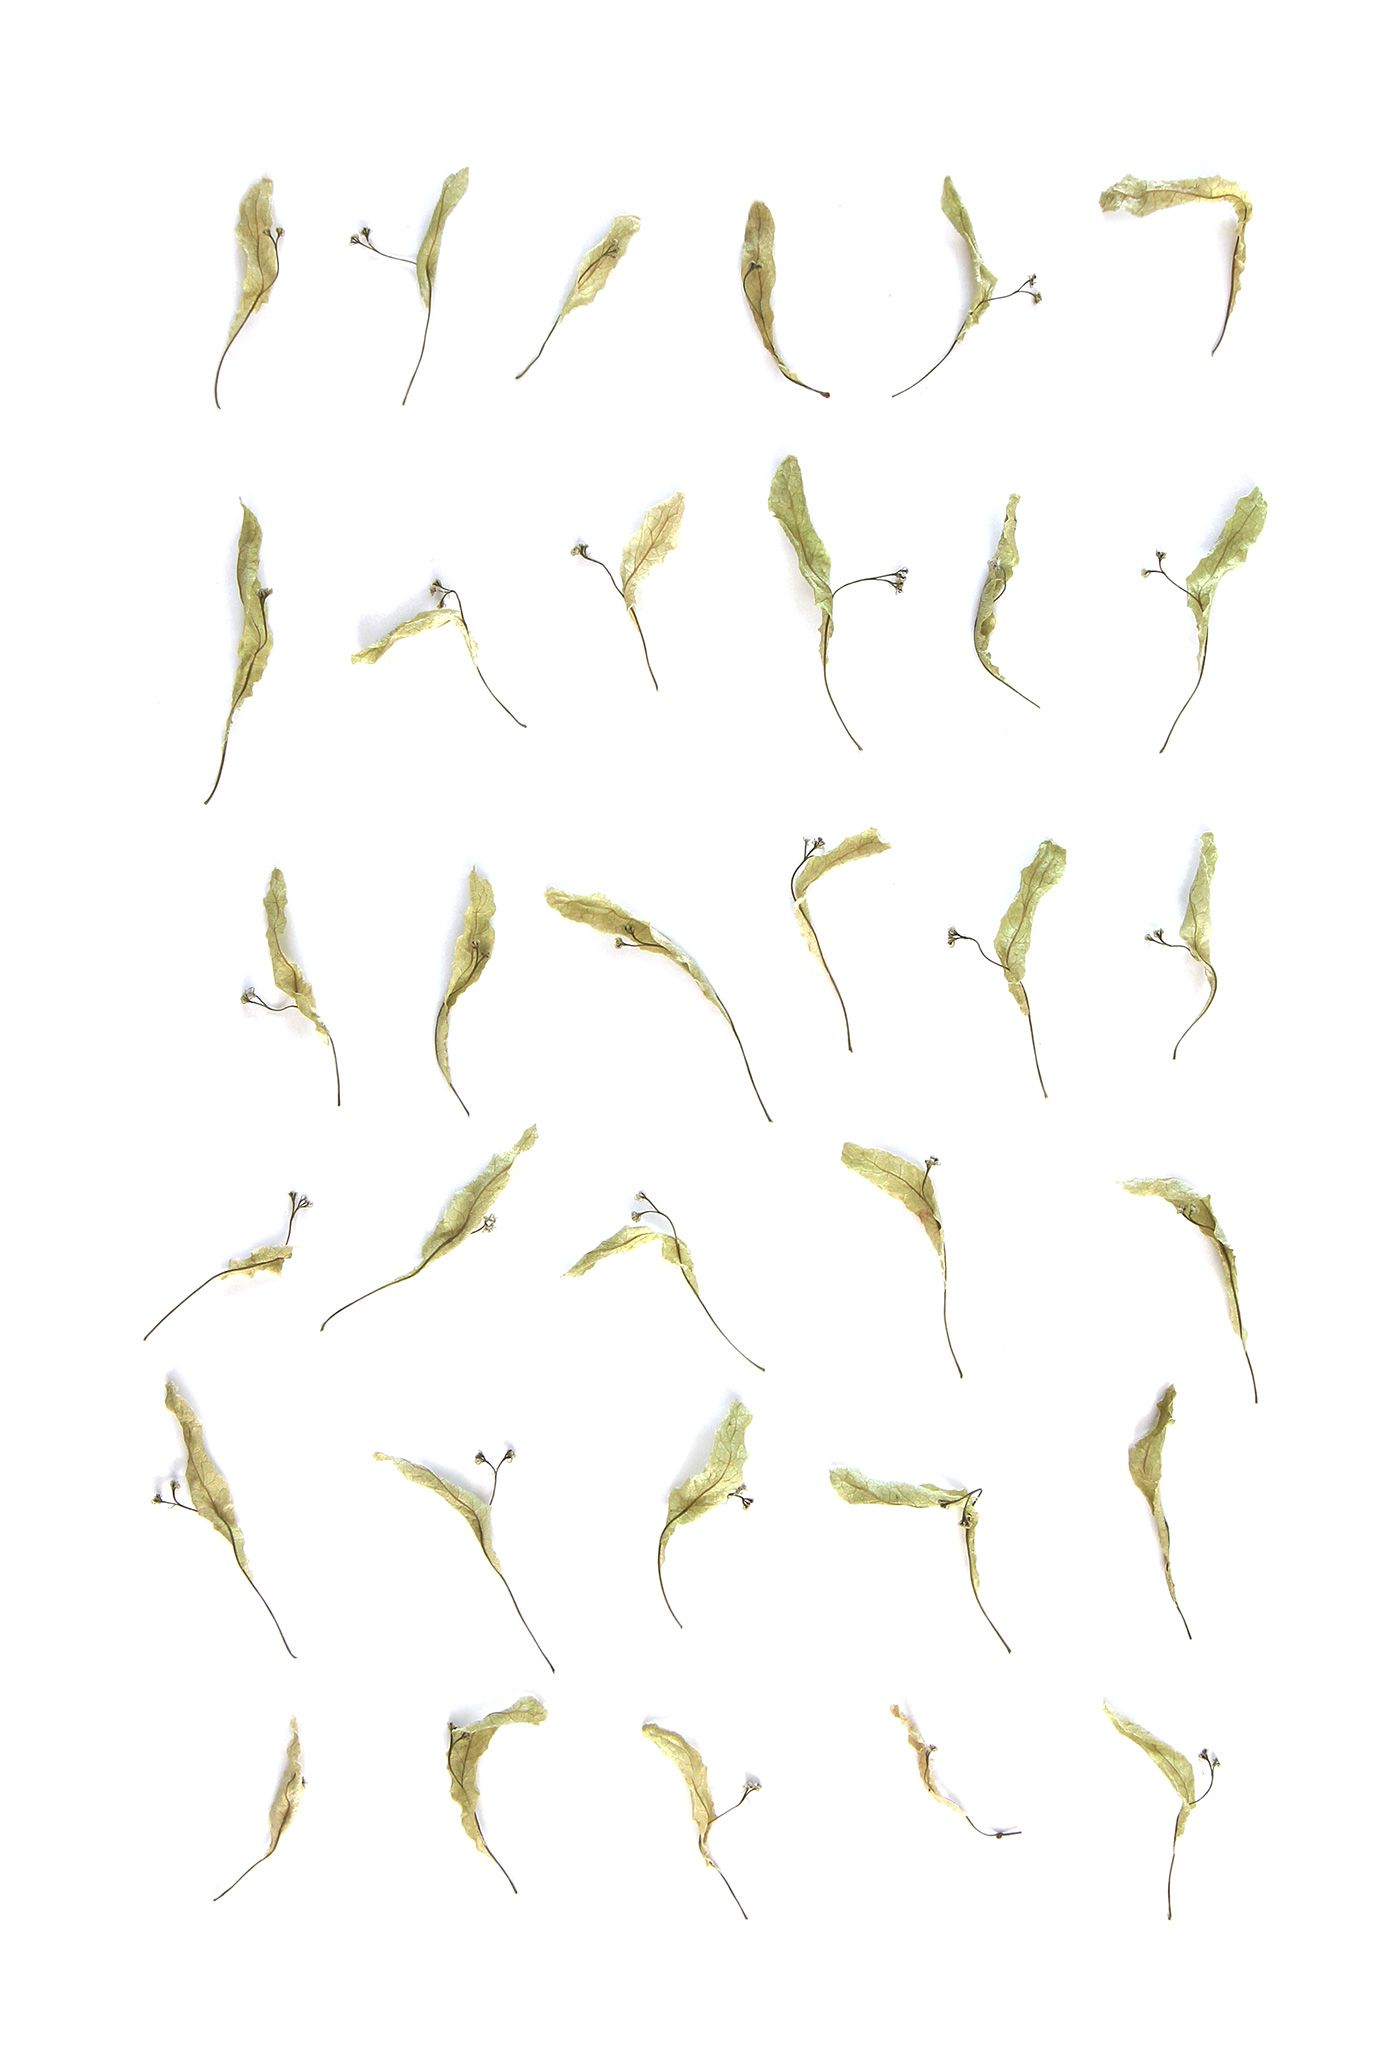 linden bracts (mary jo hoffman)